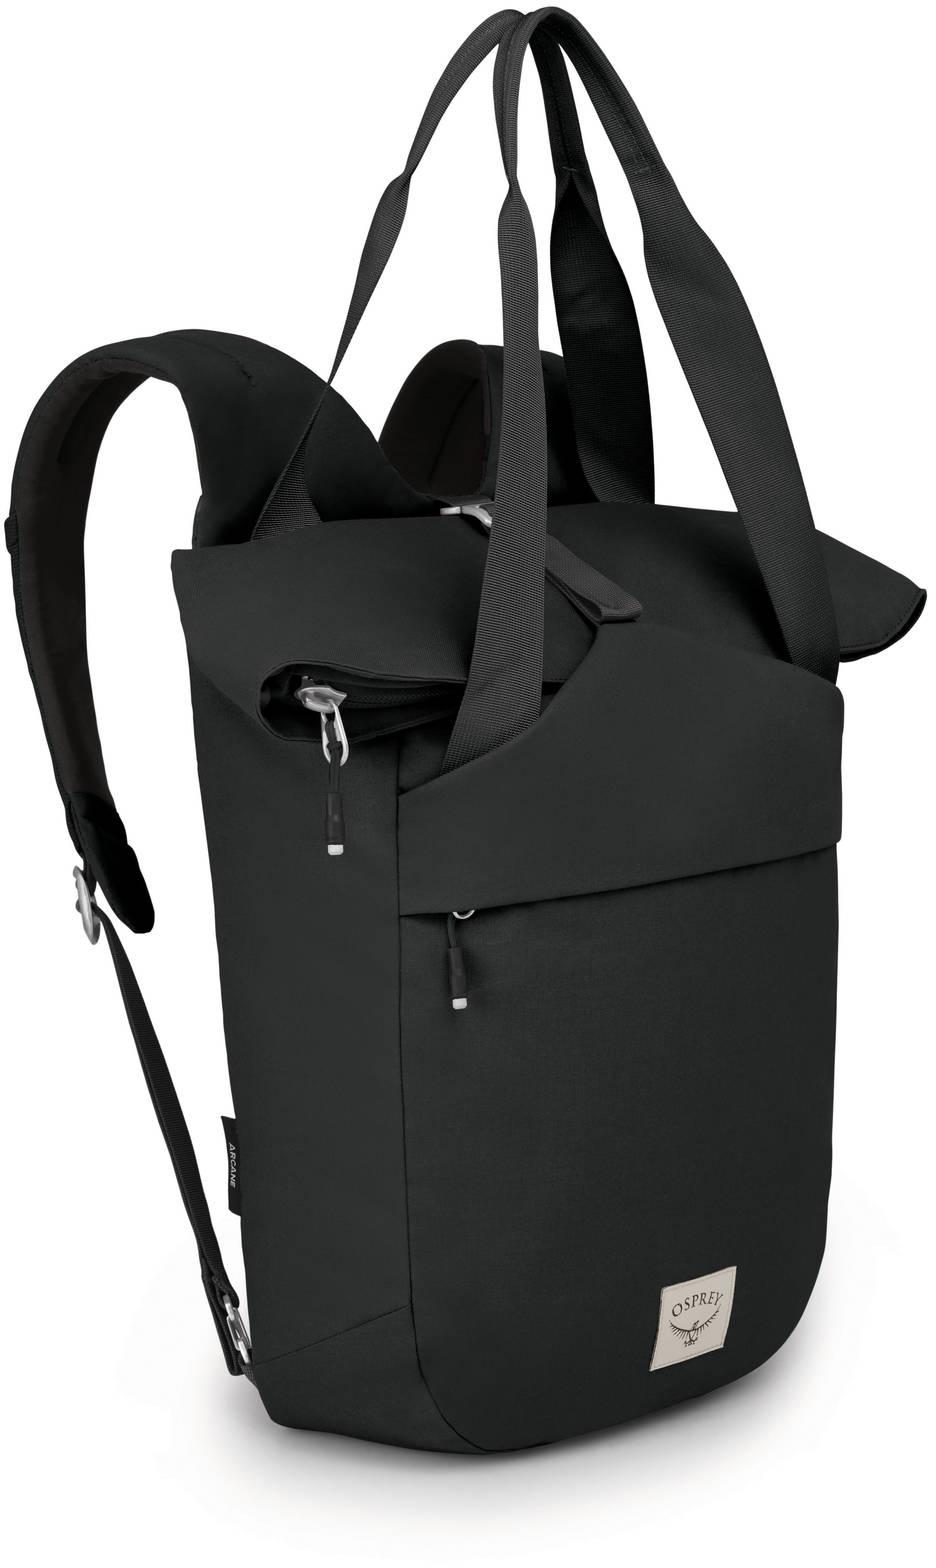 Городские рюкзаки Рюкзак сумка Osprey Arcane Tote Stonewash Black Arcane_Tote_Pack_S20_Side_Stonewash_Black_web.jpg